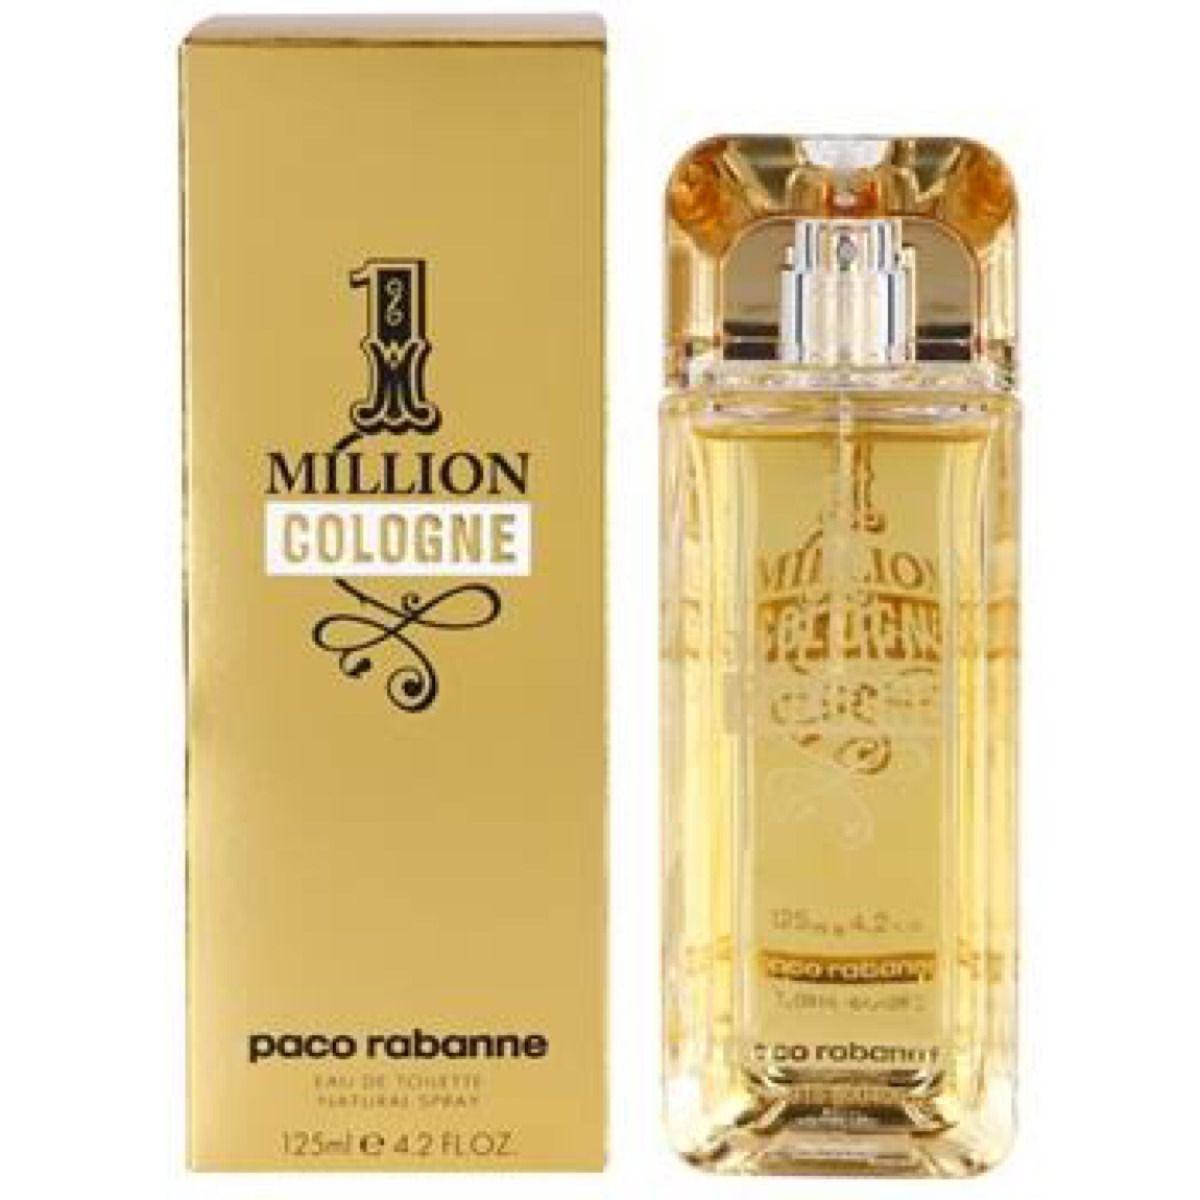 1 Million Cologne Paco Rabanne Eau de Toilette Perfume Masculino